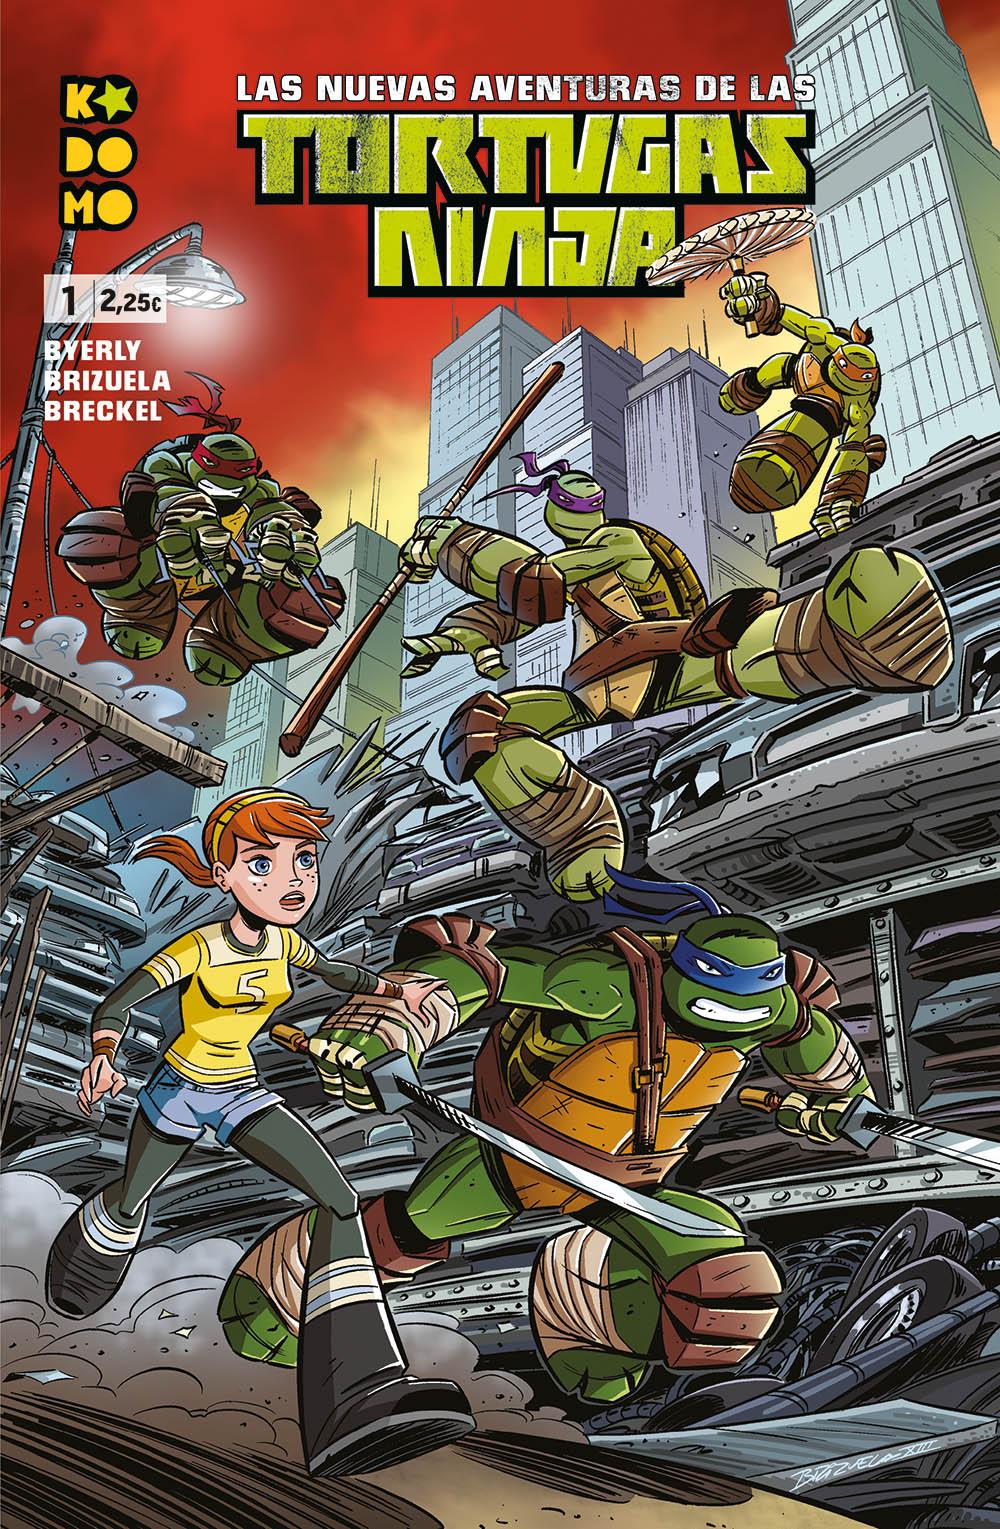 Las nuevas aventuras de las Tortugas Ninja núm. 1